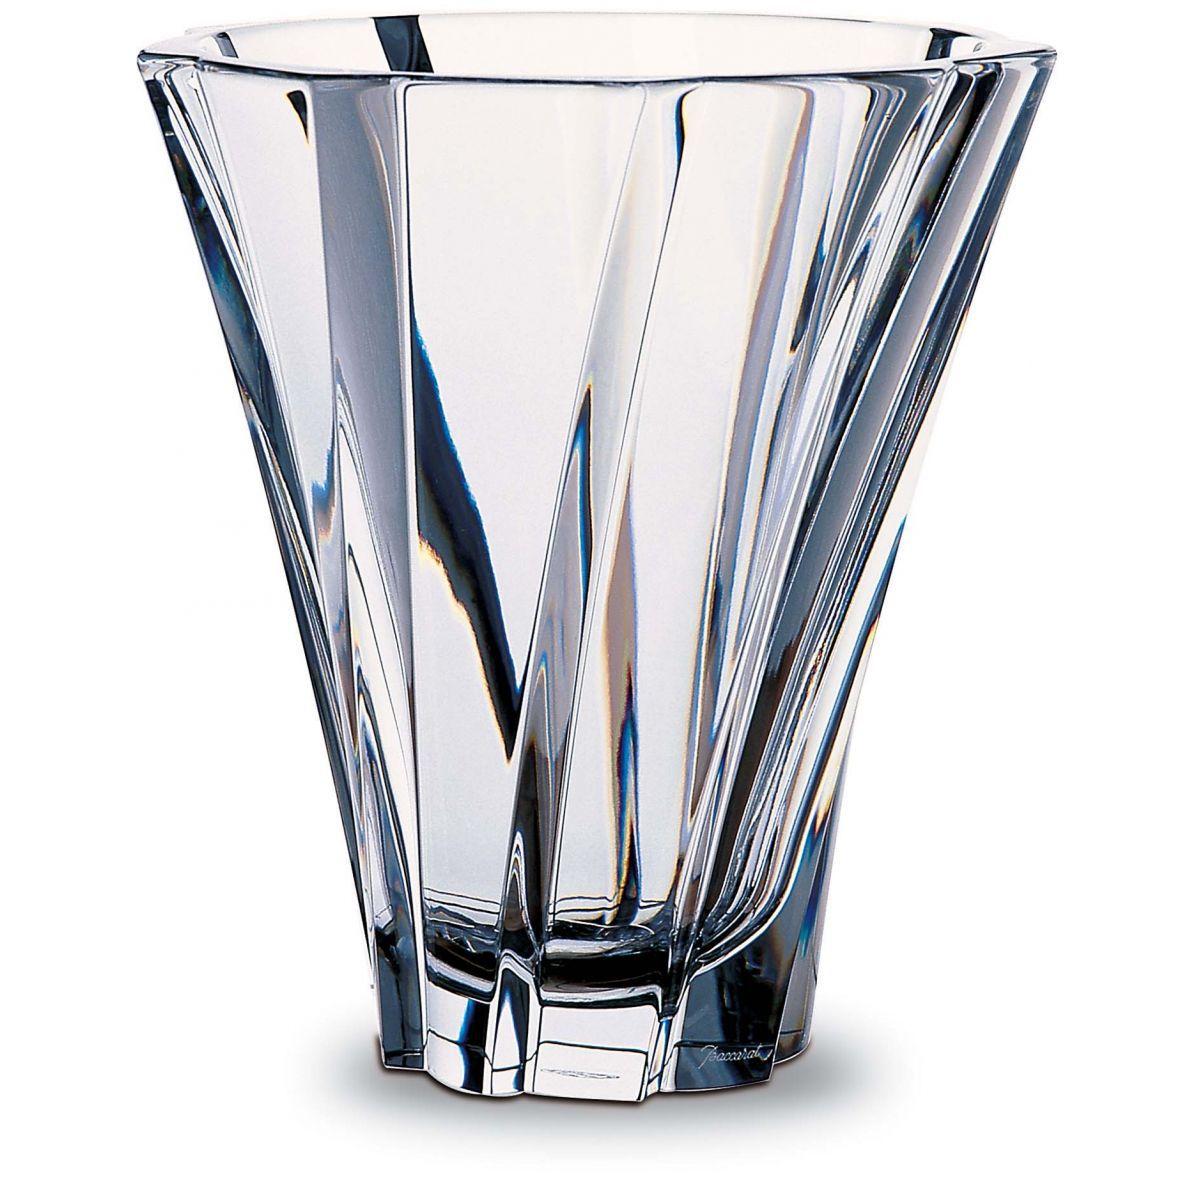 Vaso Objectif G 25cm, Baccarat, 2102305